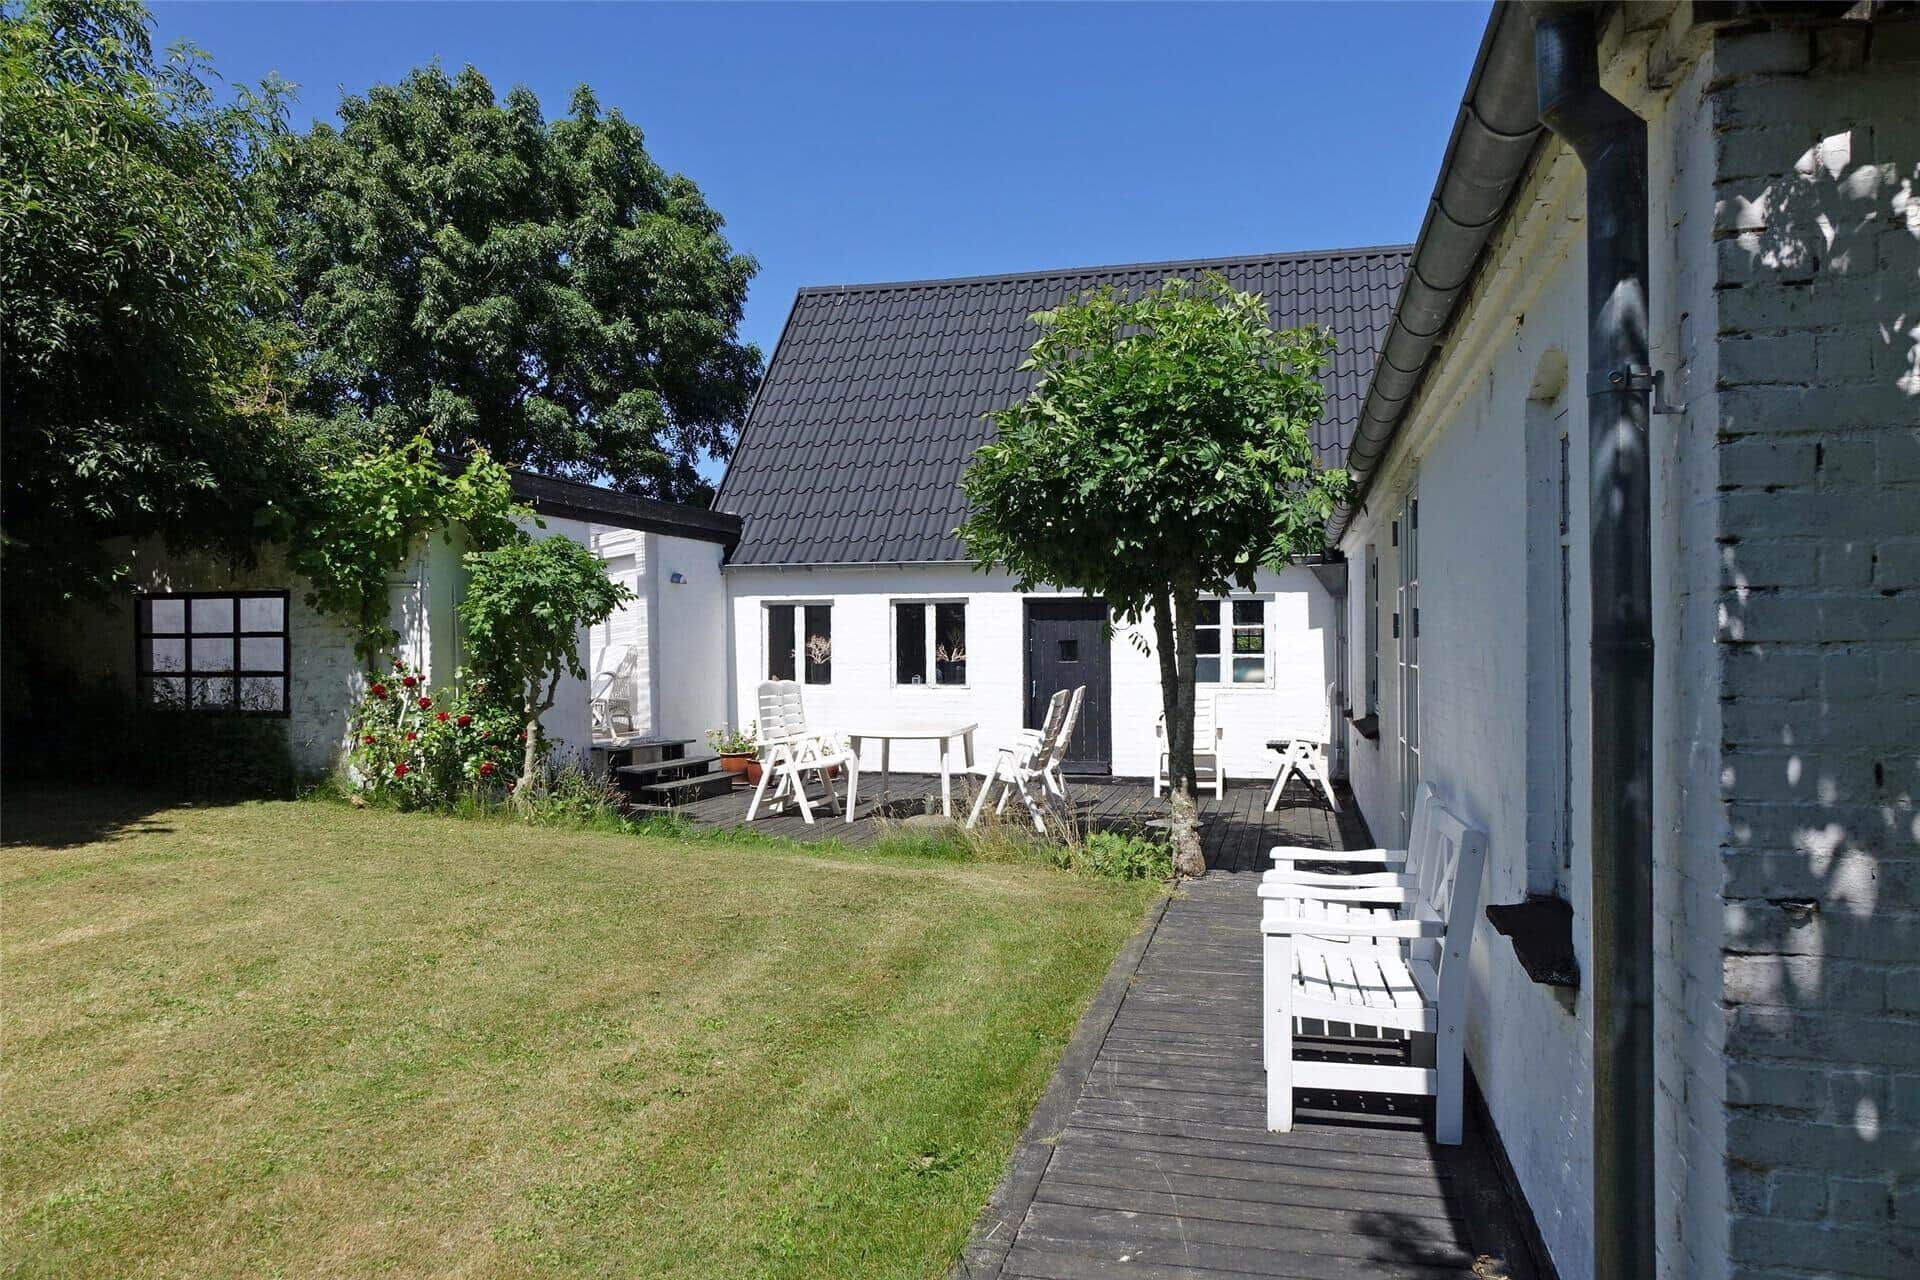 Bild 1-170 Ferienhaus 20321, Teglværksvej 10, DK - 8305 Samsø